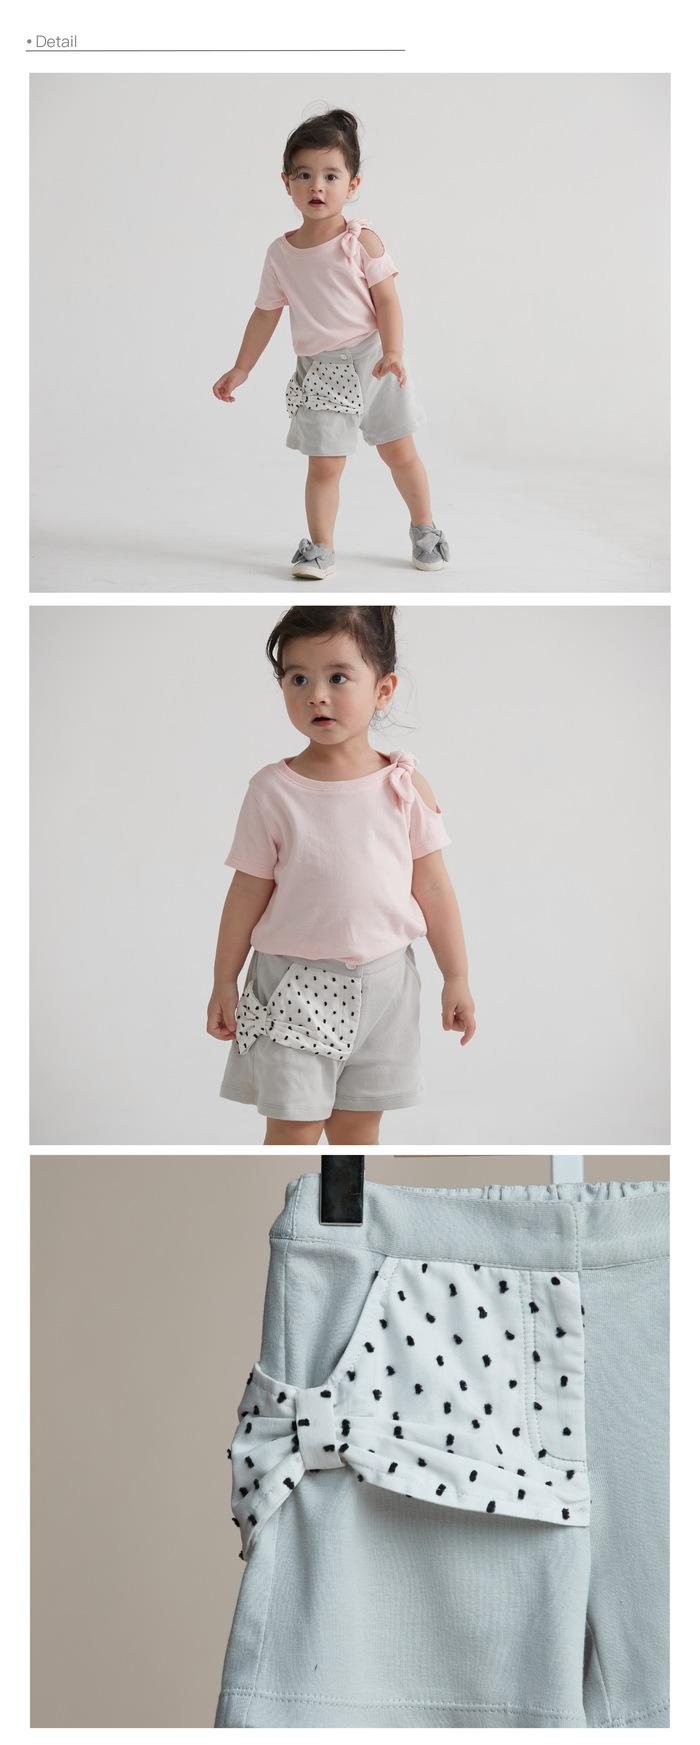 baby baby cool|The gift - 法式蝴蝶結短褲